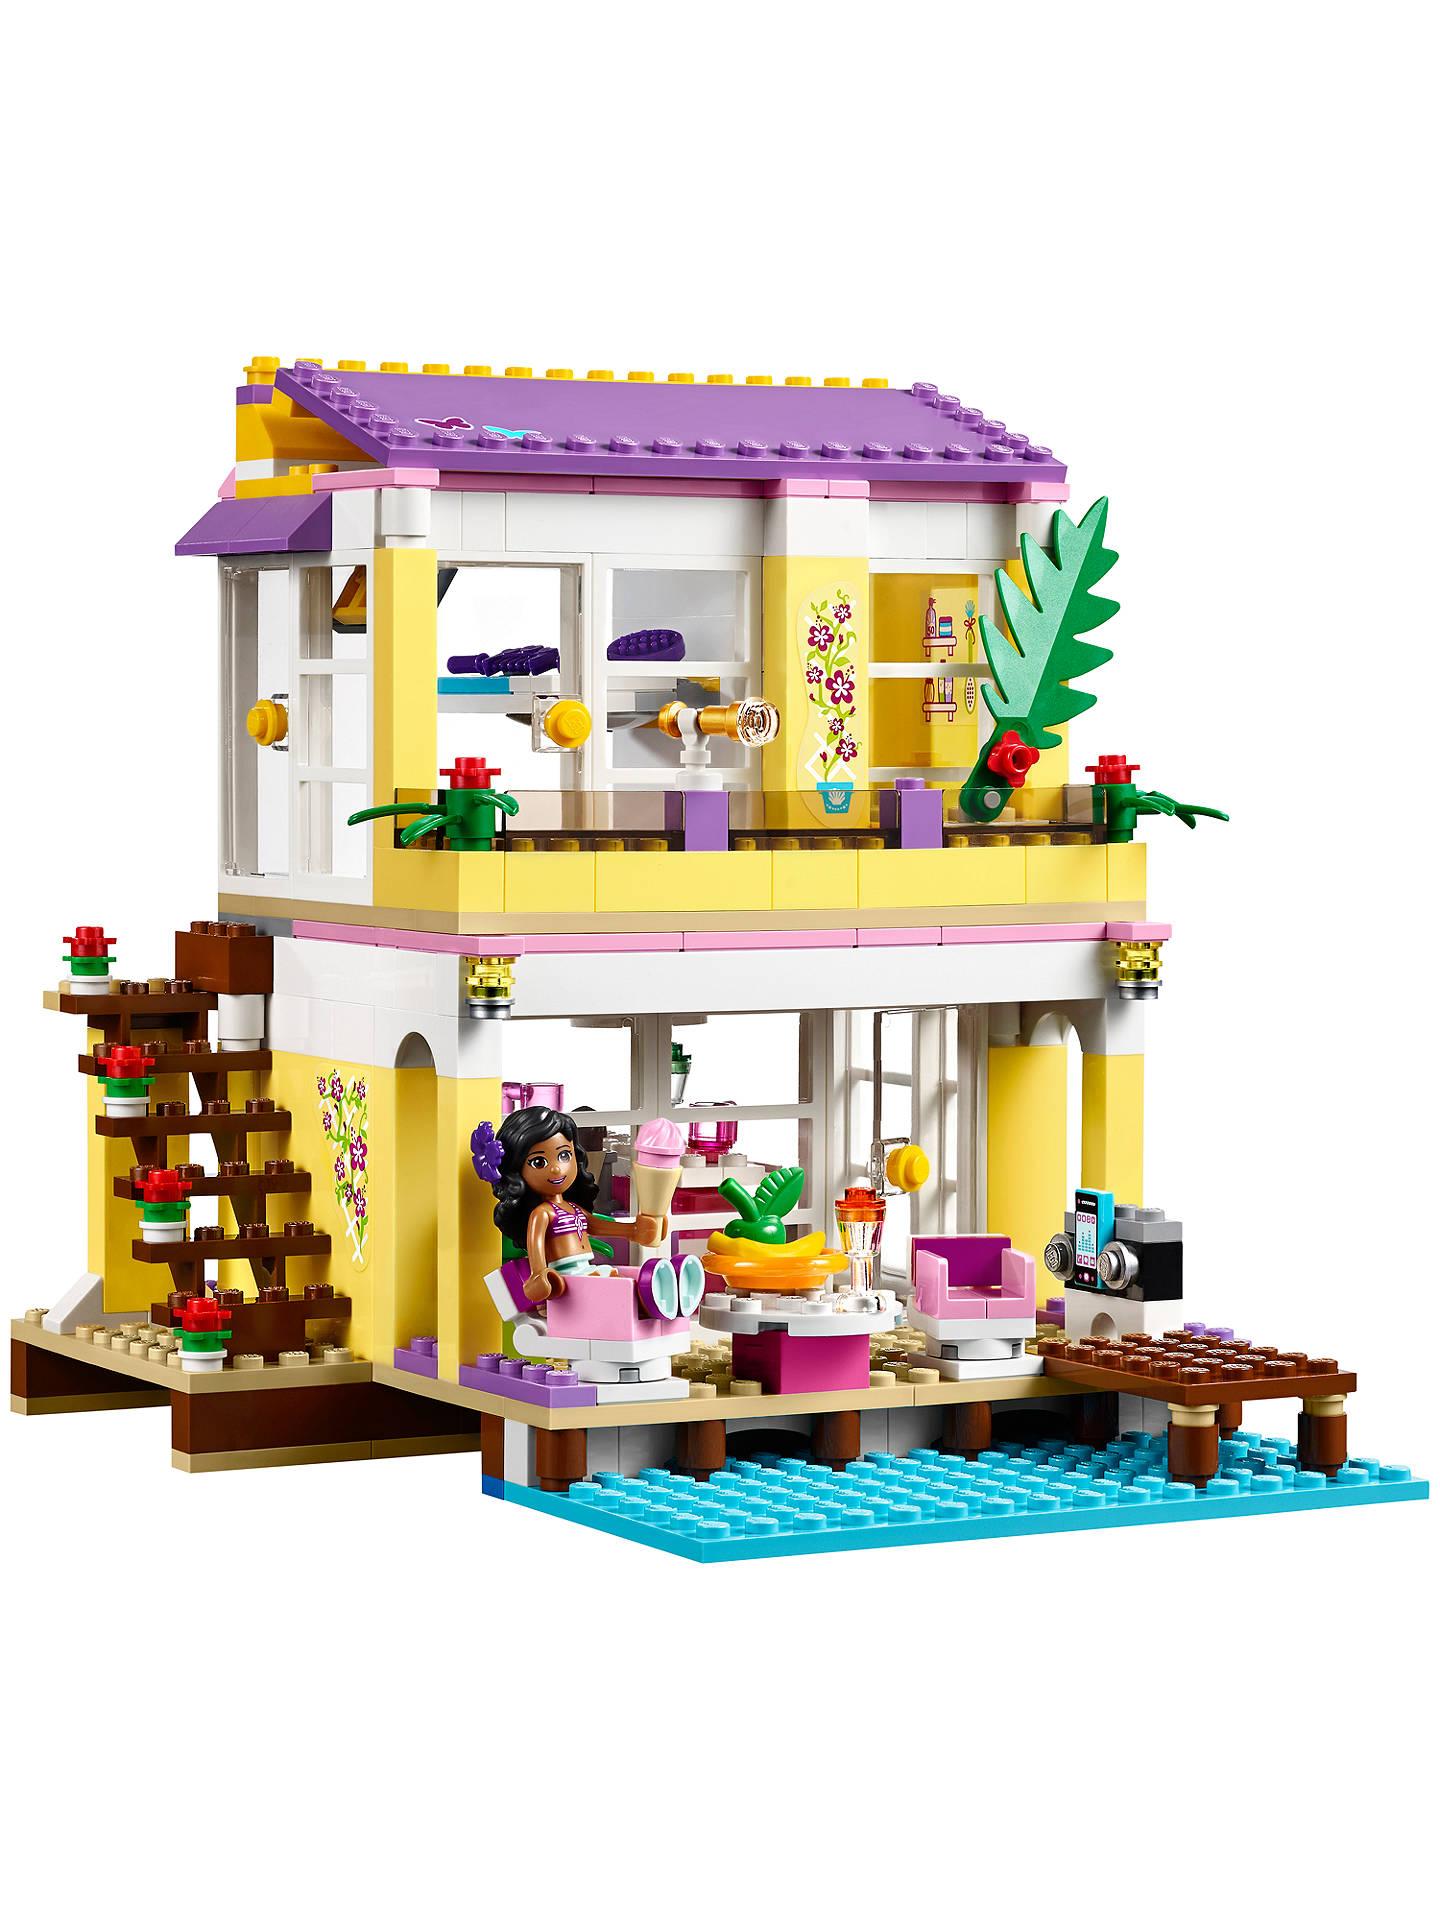 LEGO Friends Stephanie's Beach House at John Lewis & Partners